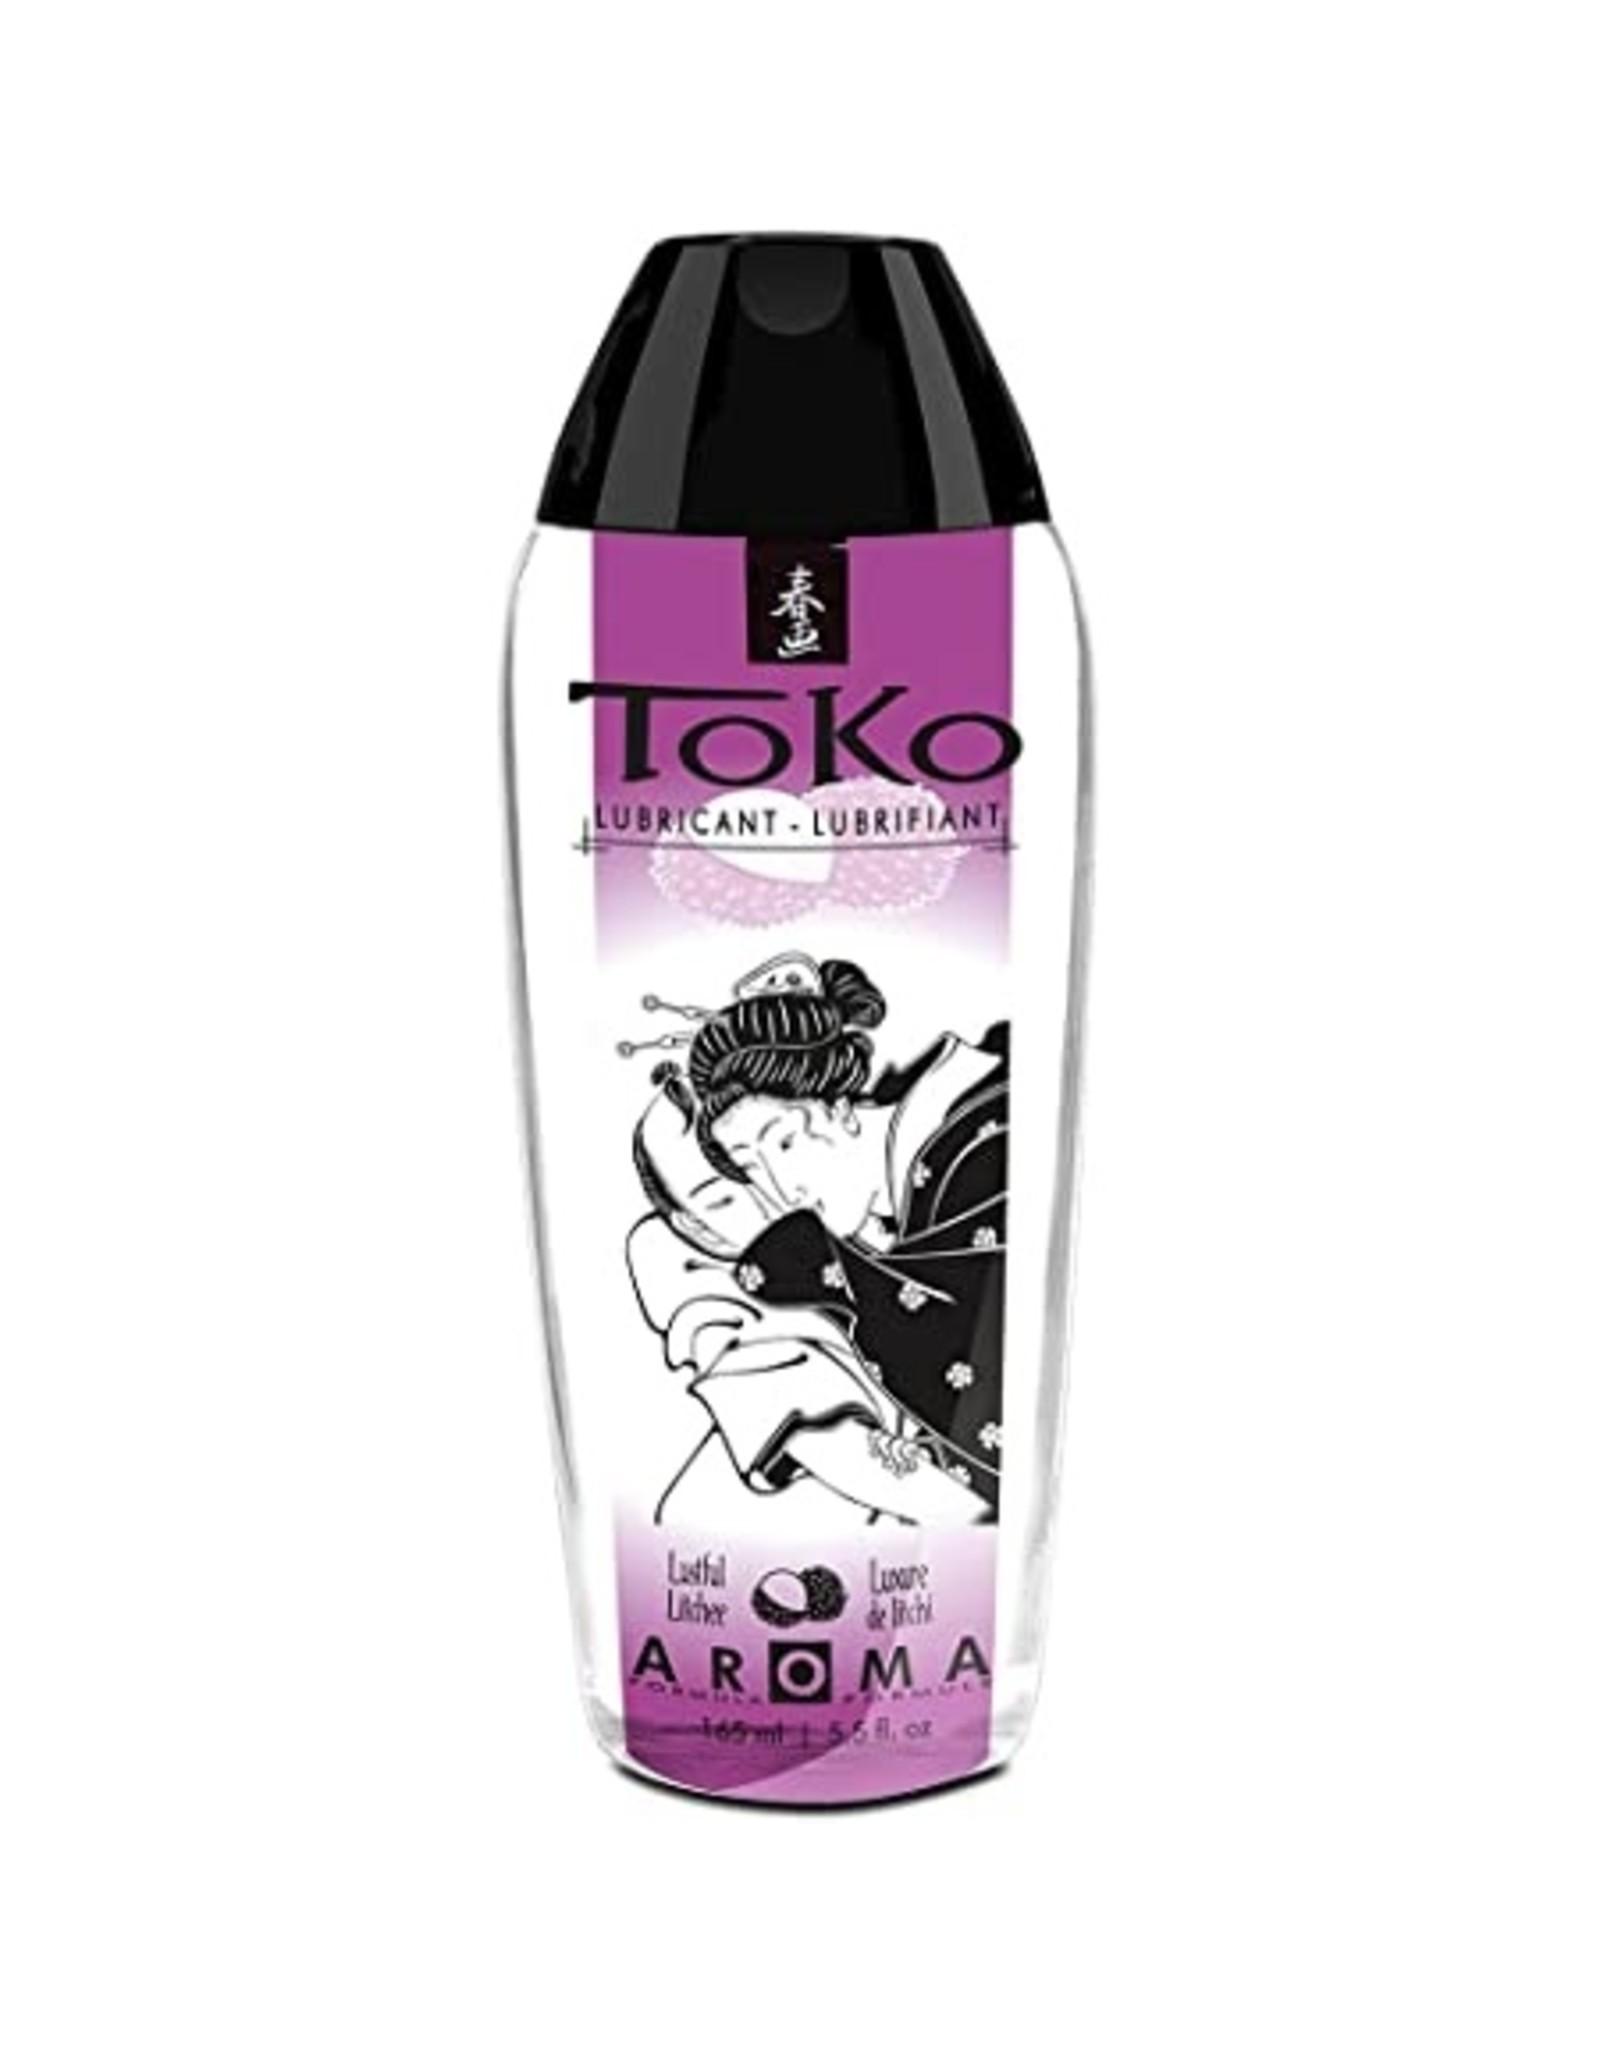 Shunga Toko Aroma Flavoured Lubricant - 5.5 oz Lustful